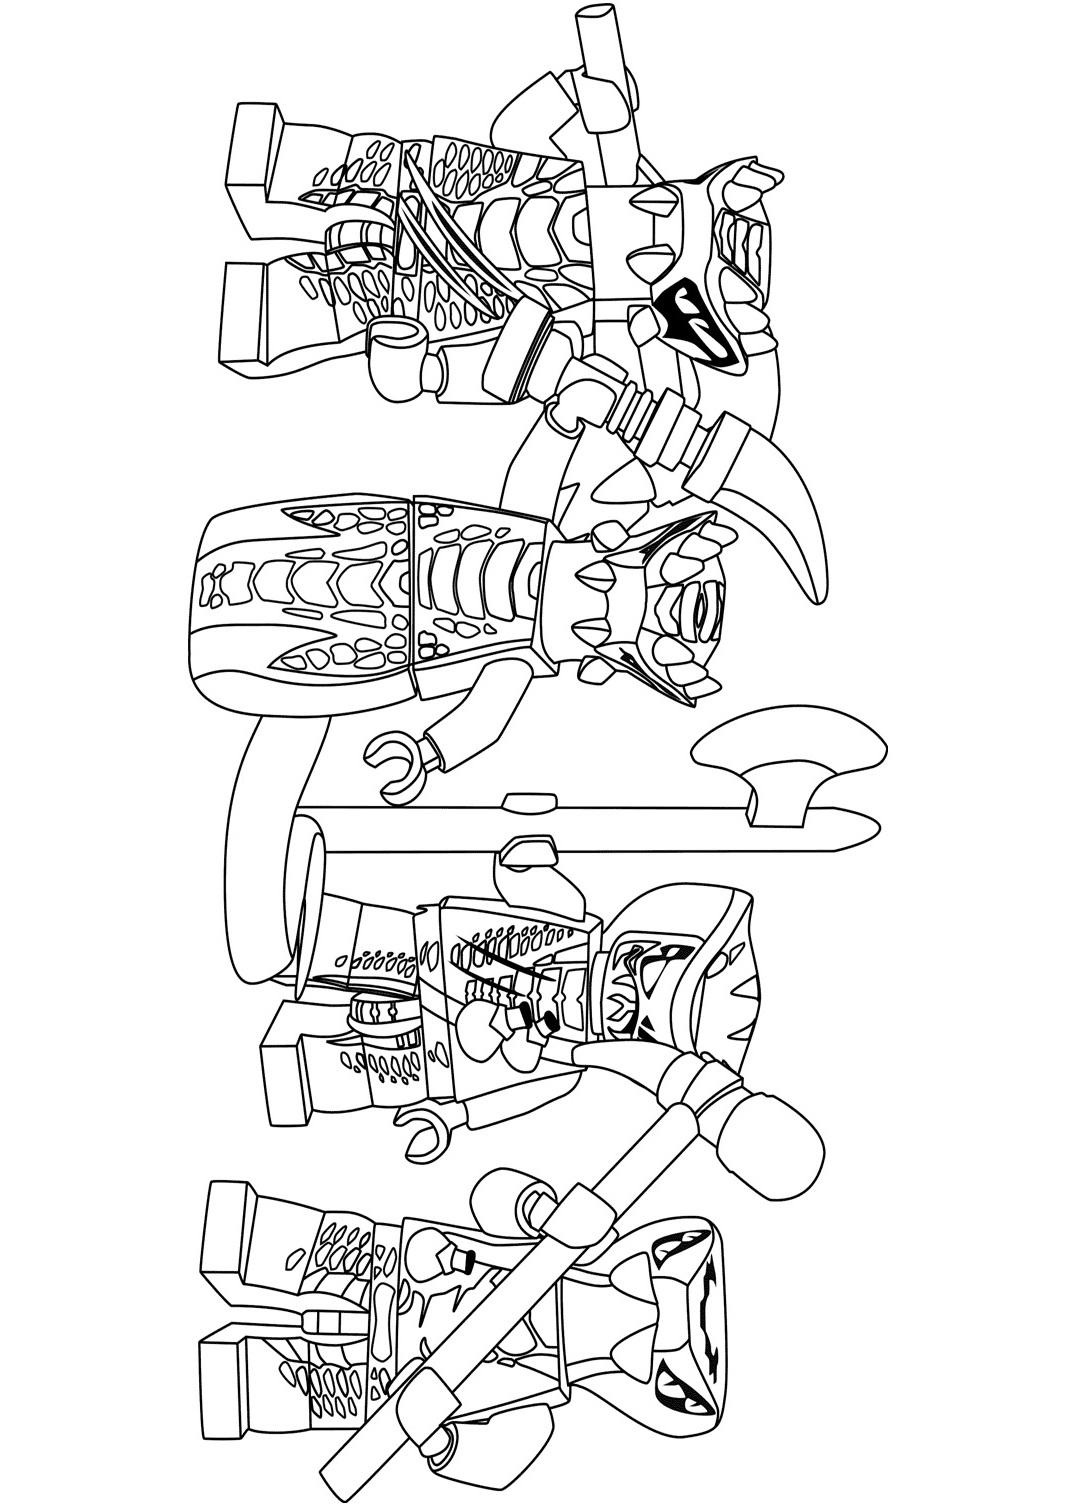 Venomari from Lego Ninjago Coloring Page